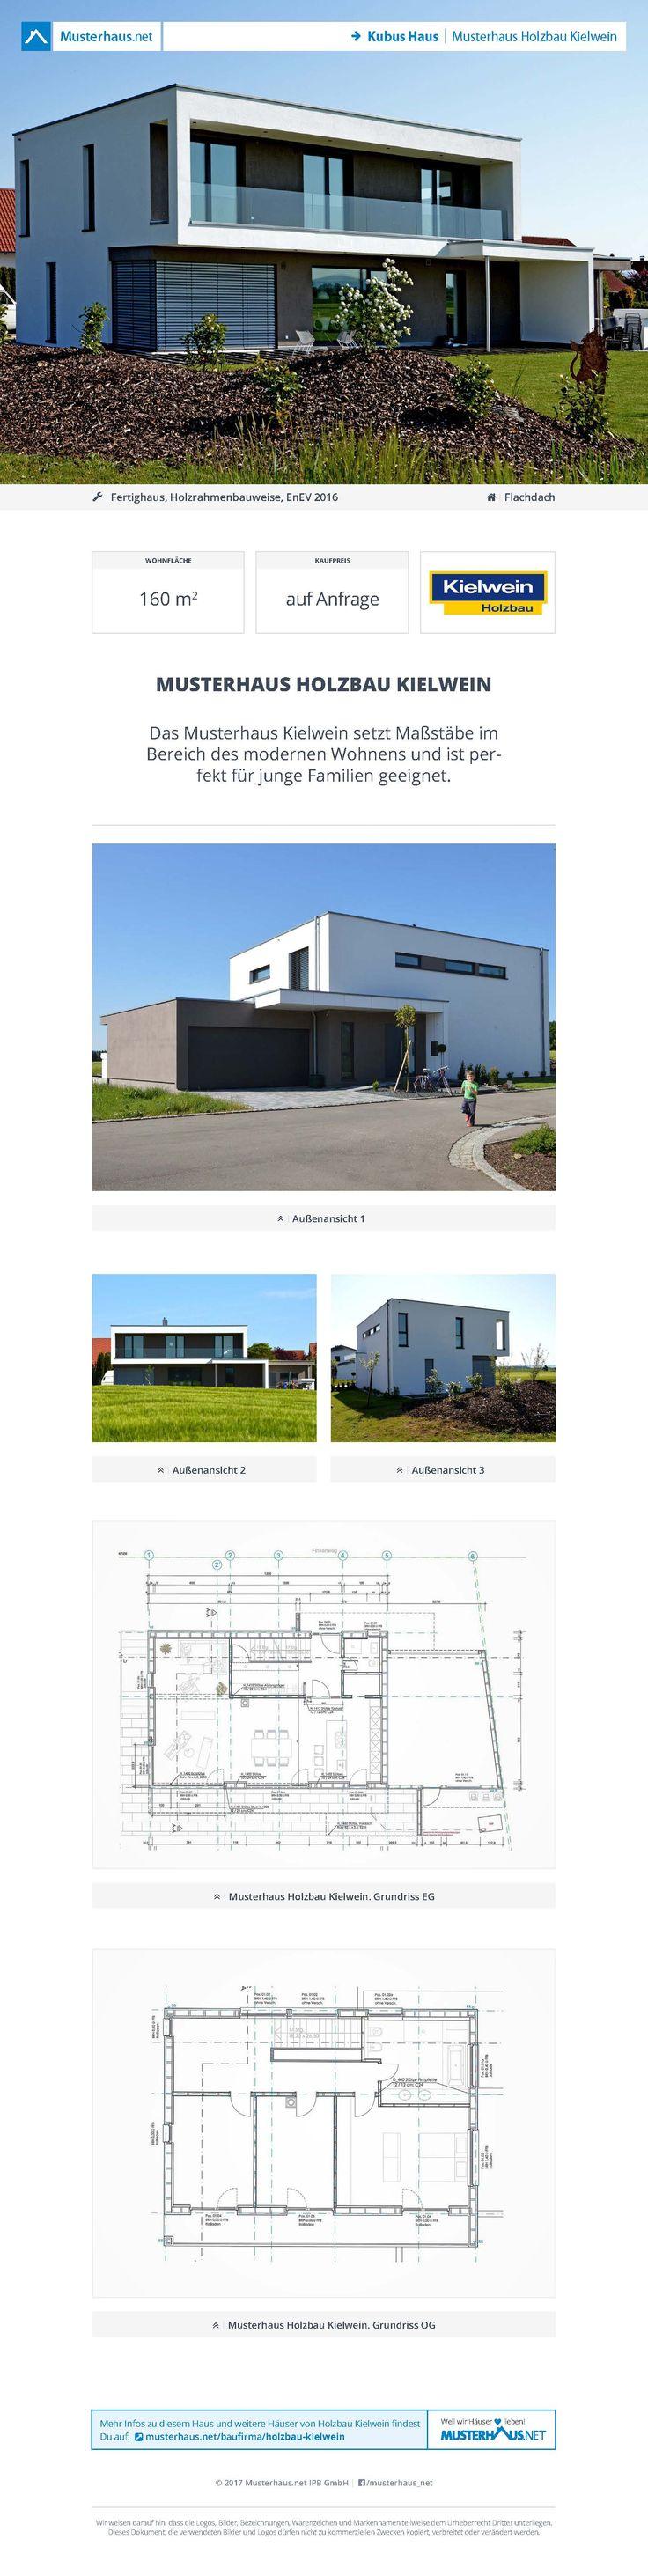 #Kubus Haus · Musterhaus Holzbau Kielwein · Holzbau Kielwein · Jetzt bei #Musterhaus.net Unterlagen anfordern!